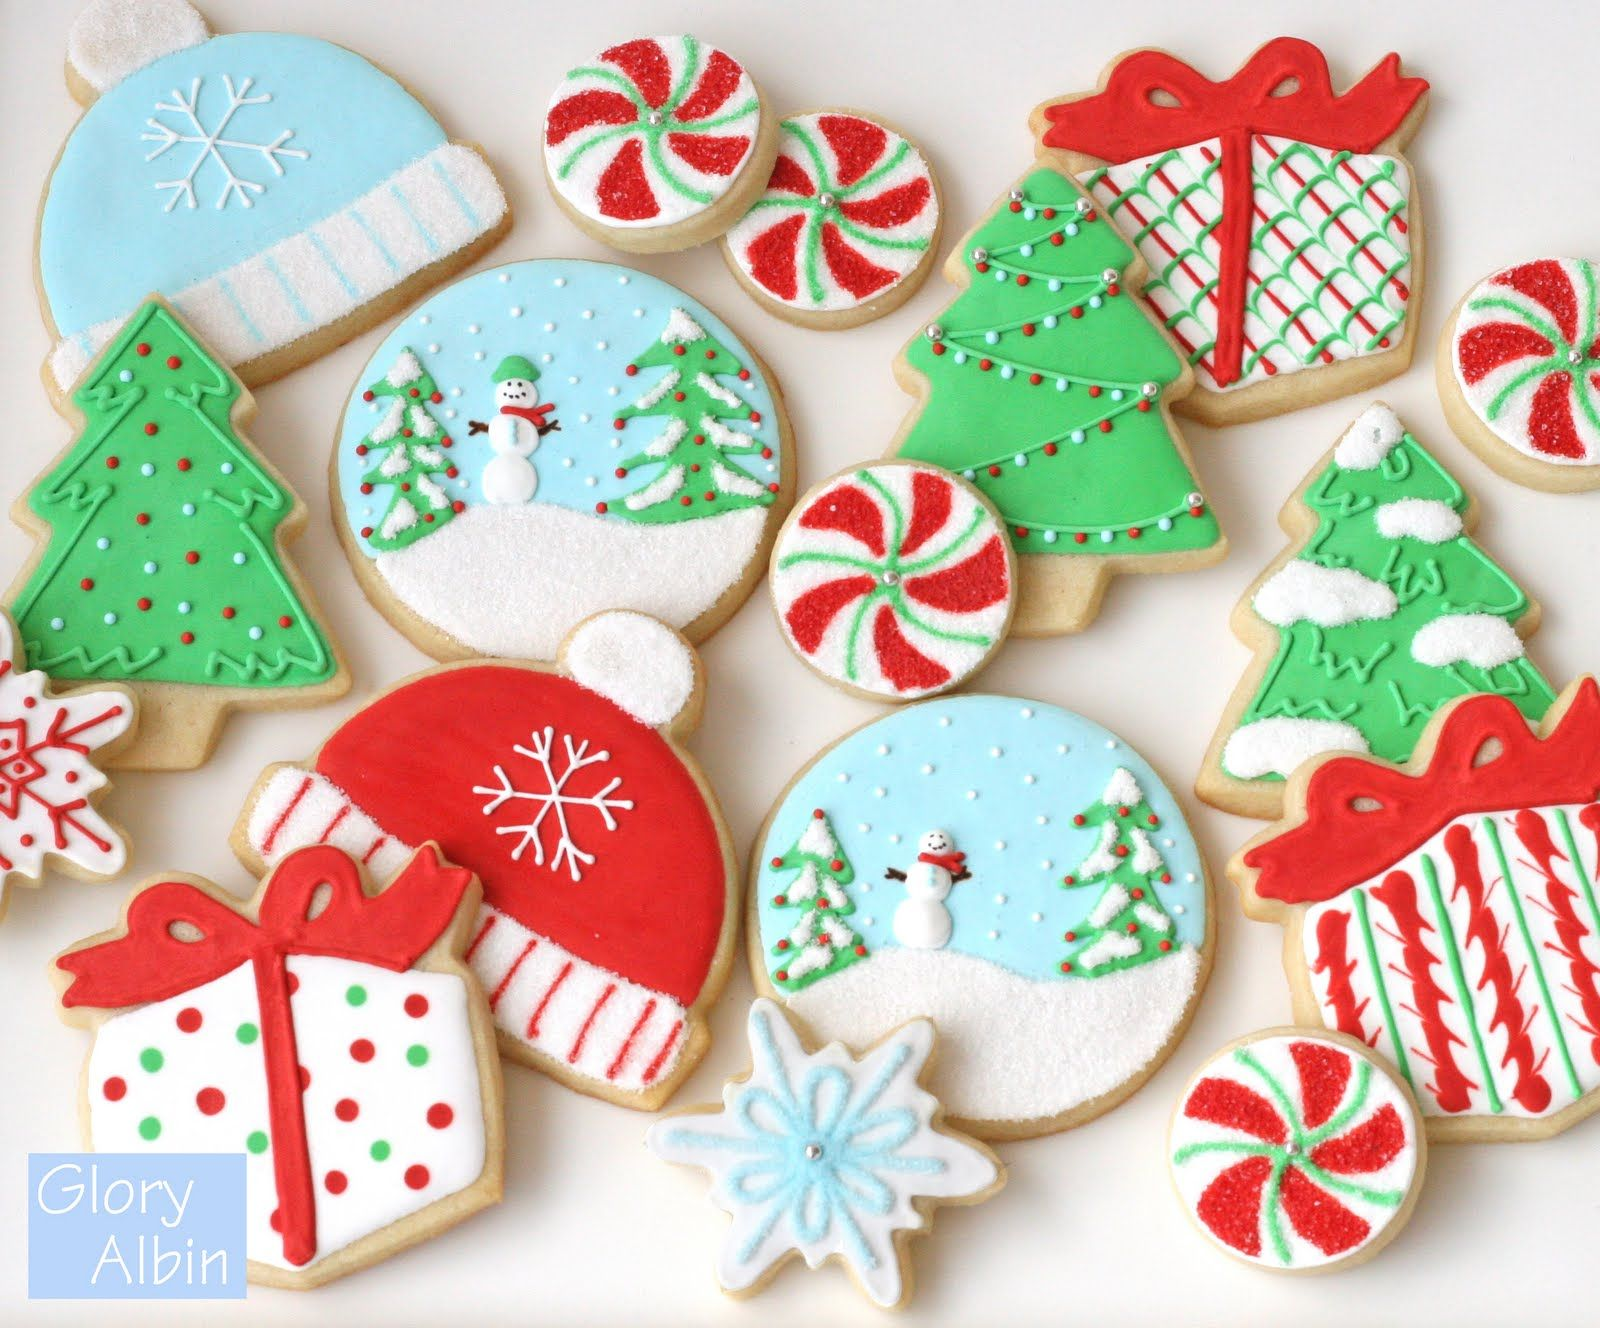 Decorating Sugar Cookies with Royal Icing Royal icing